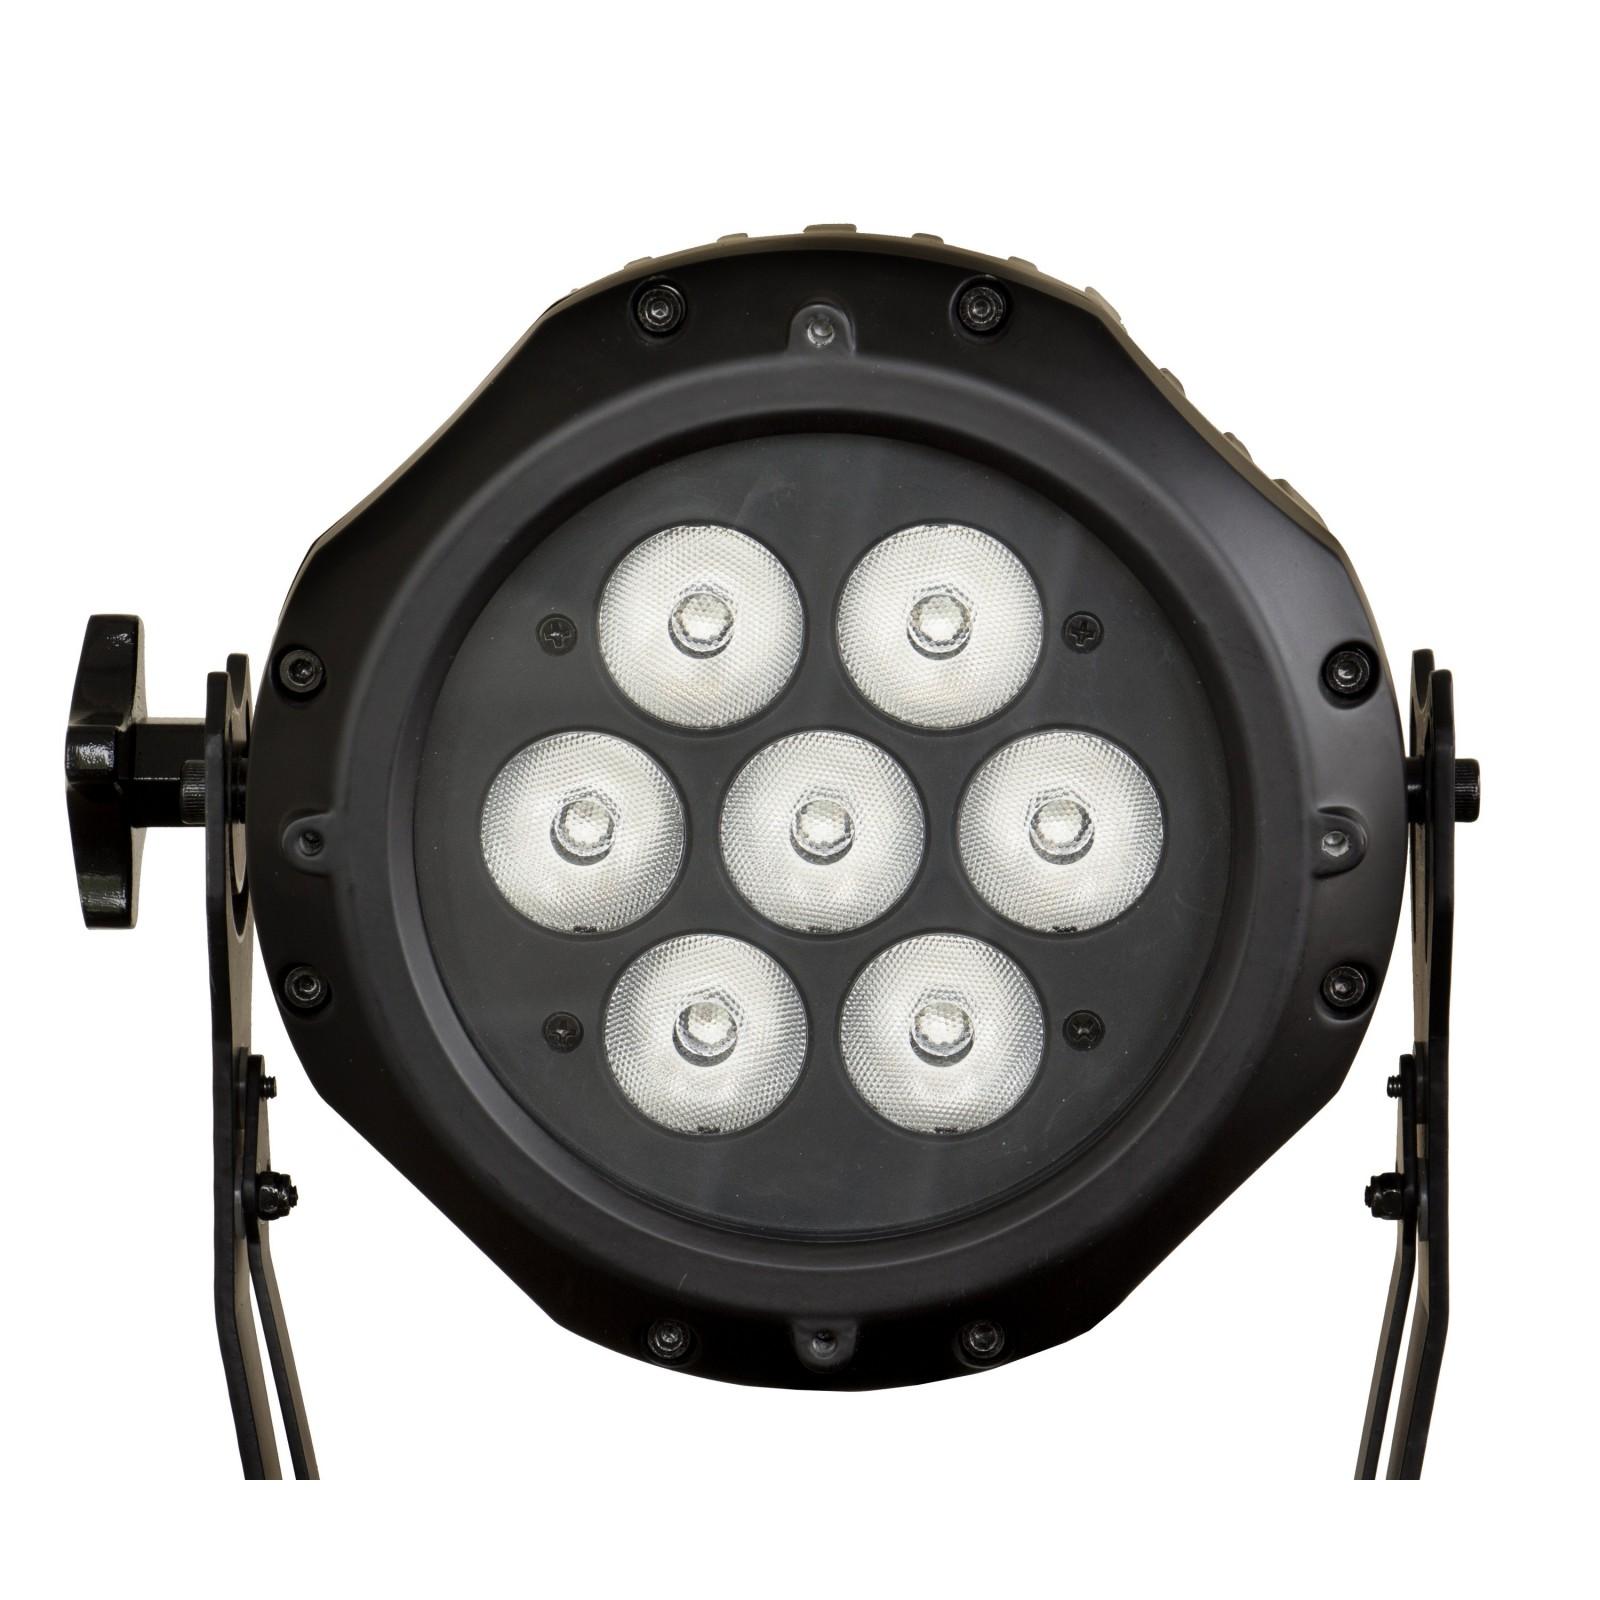 Briteq Mini Beamer Outdoor Projectors Stage Lighting